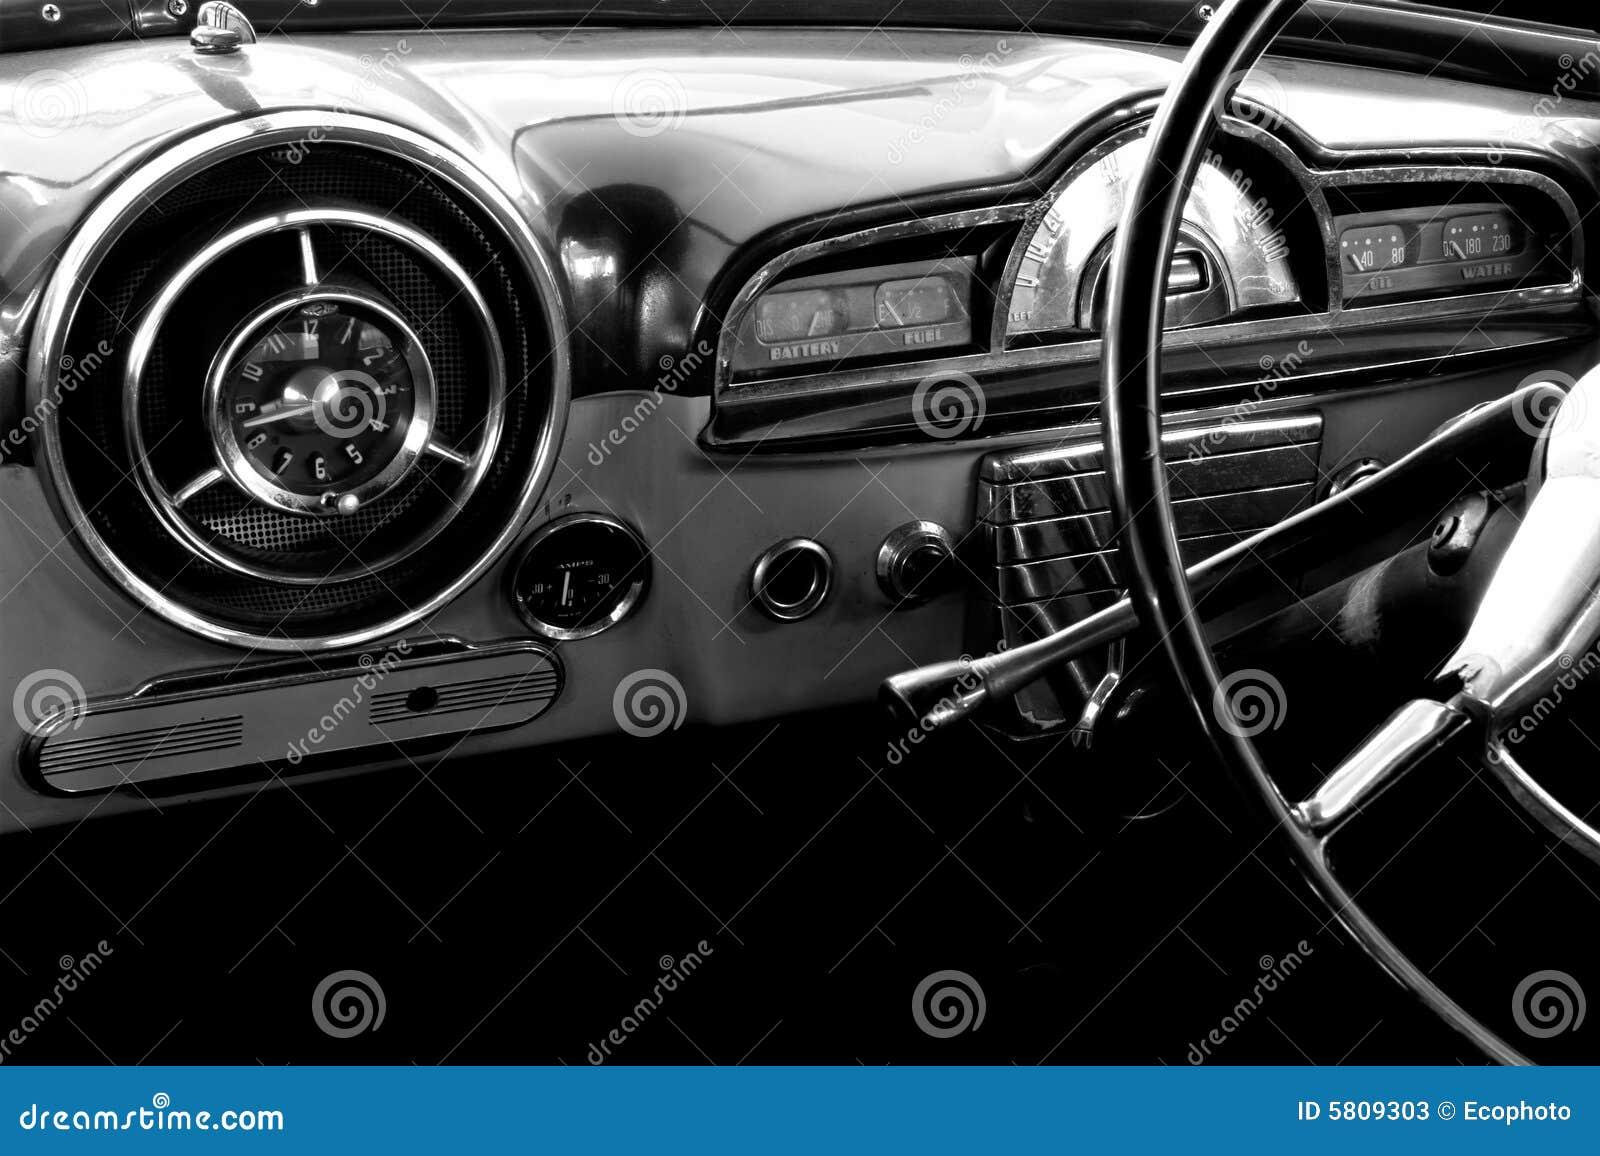 Vintage Car Stock Image Of Black Retro Mechanical